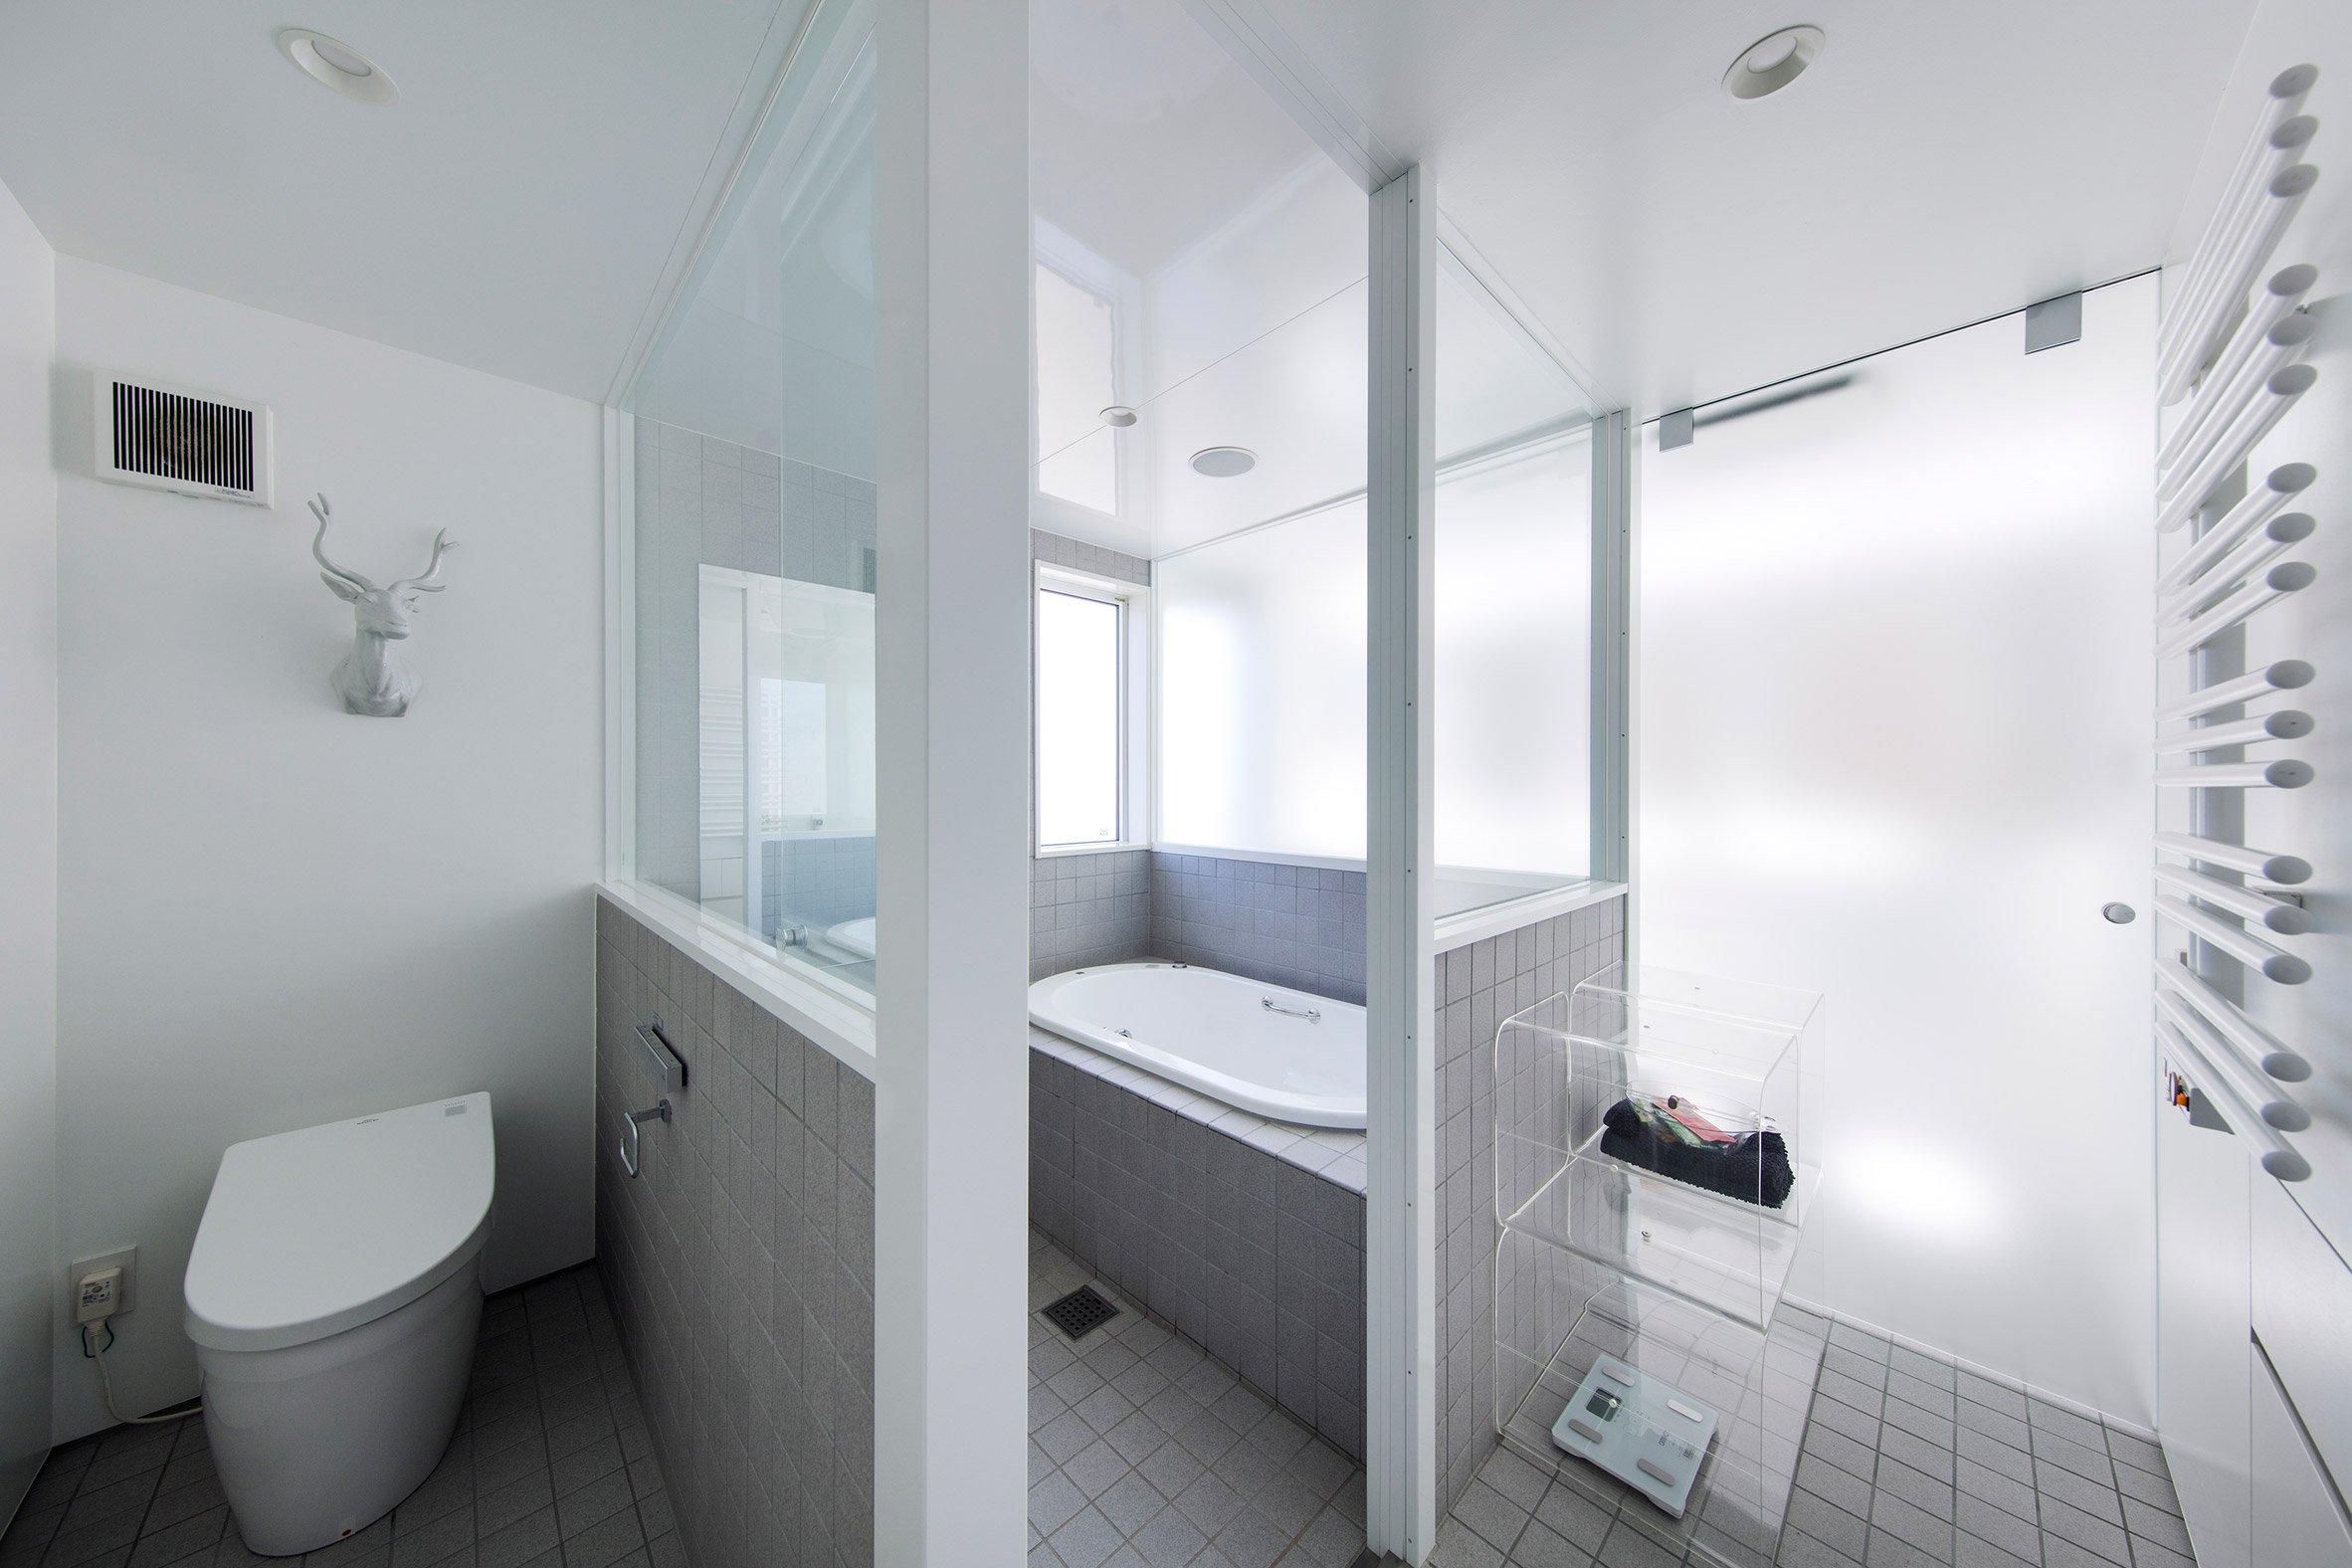 shinbohon-house-k-yuichi-yoshida-associates-architecture-residential-japan-_dezeen_2364_col_6.jpg